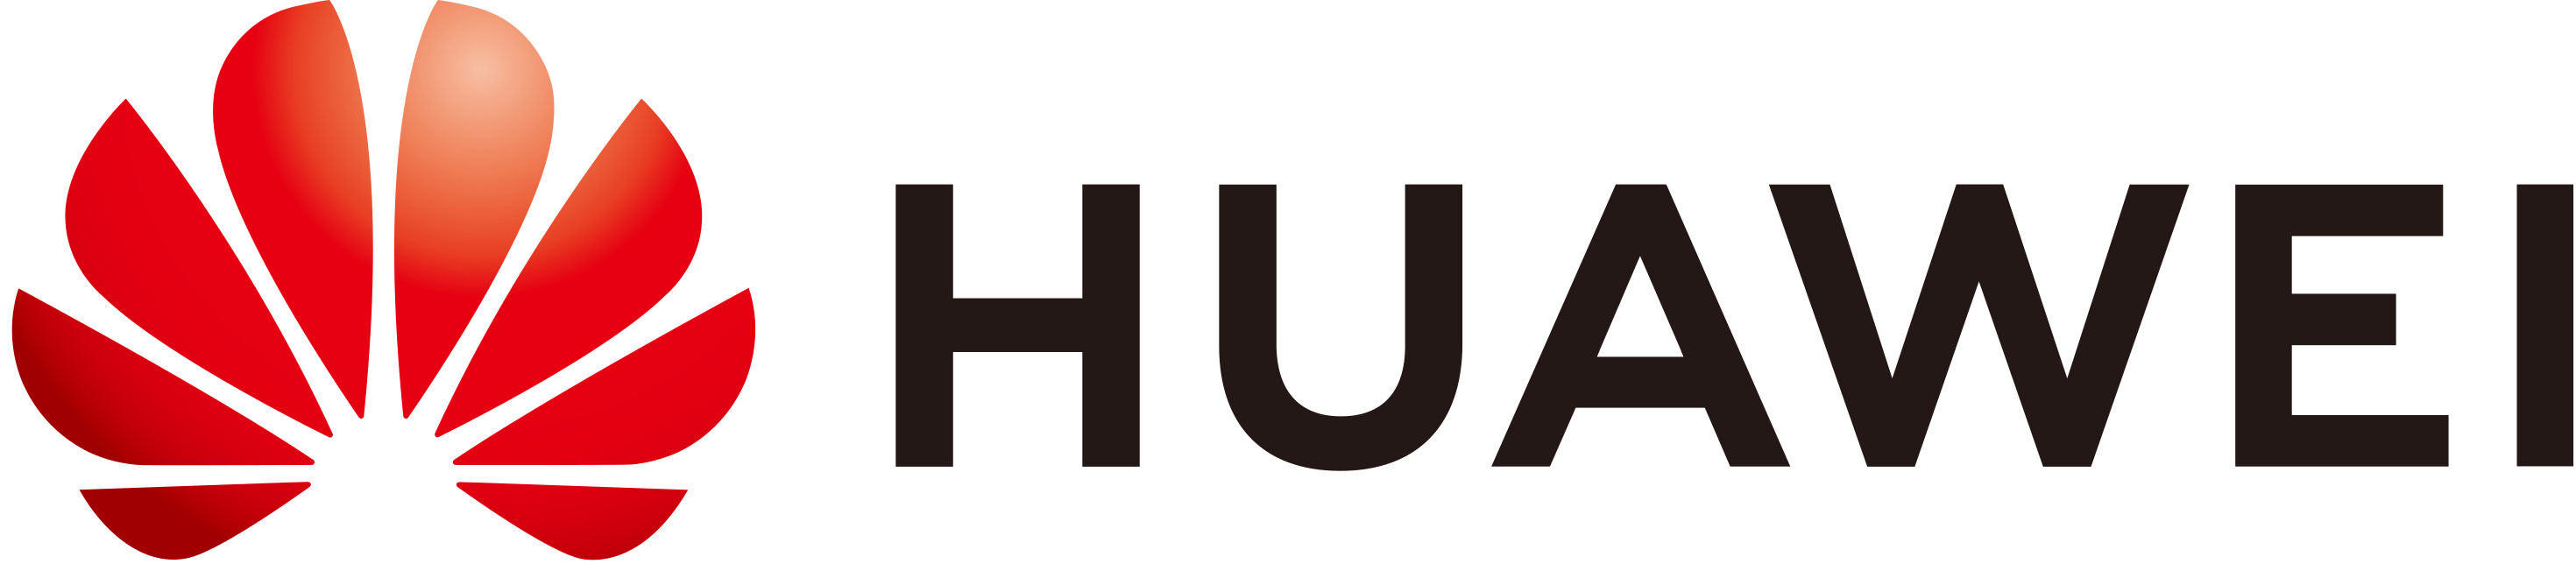 Huawei Polska logo